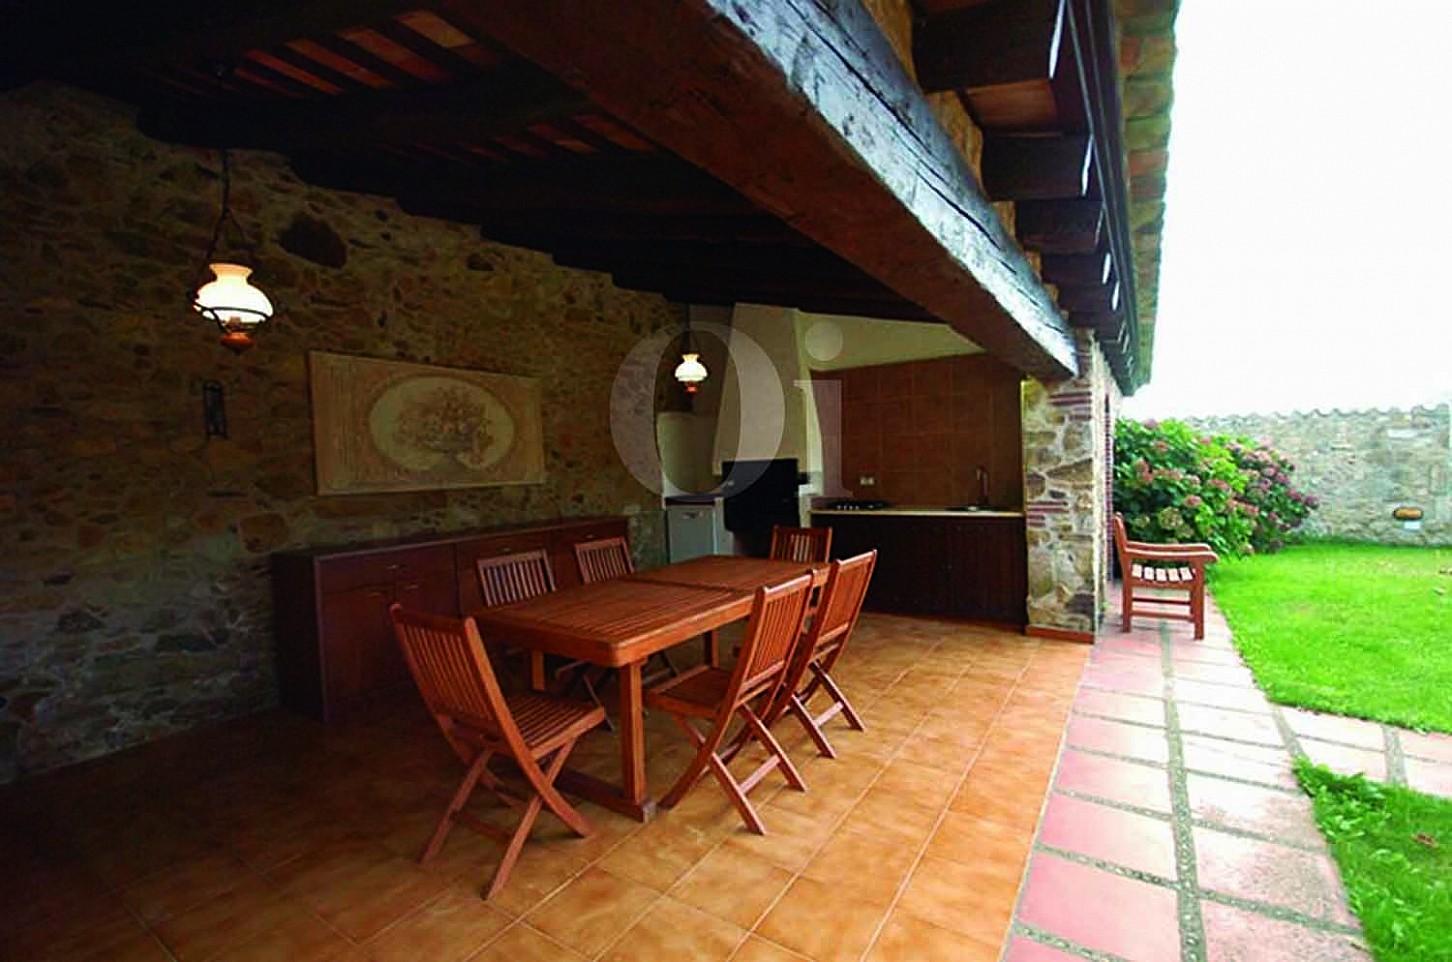 Views of mansion for sale in Calonge, Costa Brava